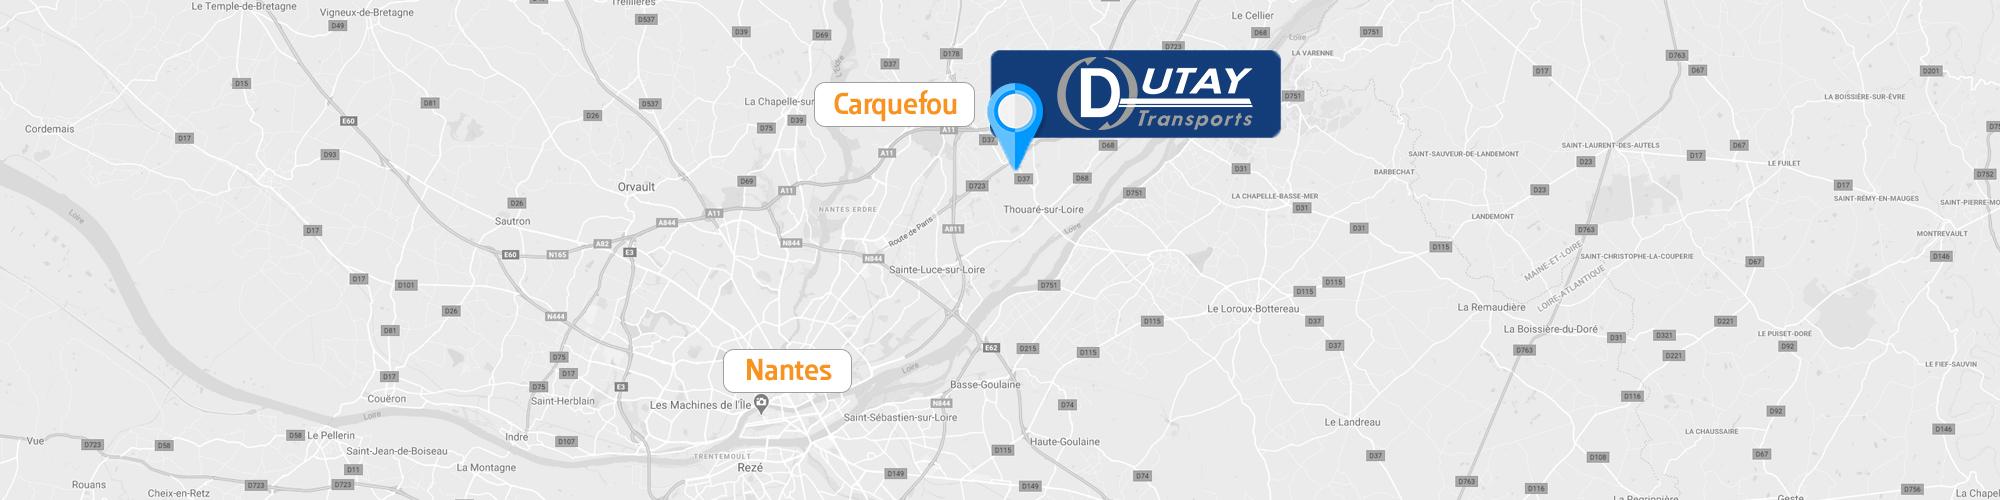 tcda-page-contact-map-transports-dutay